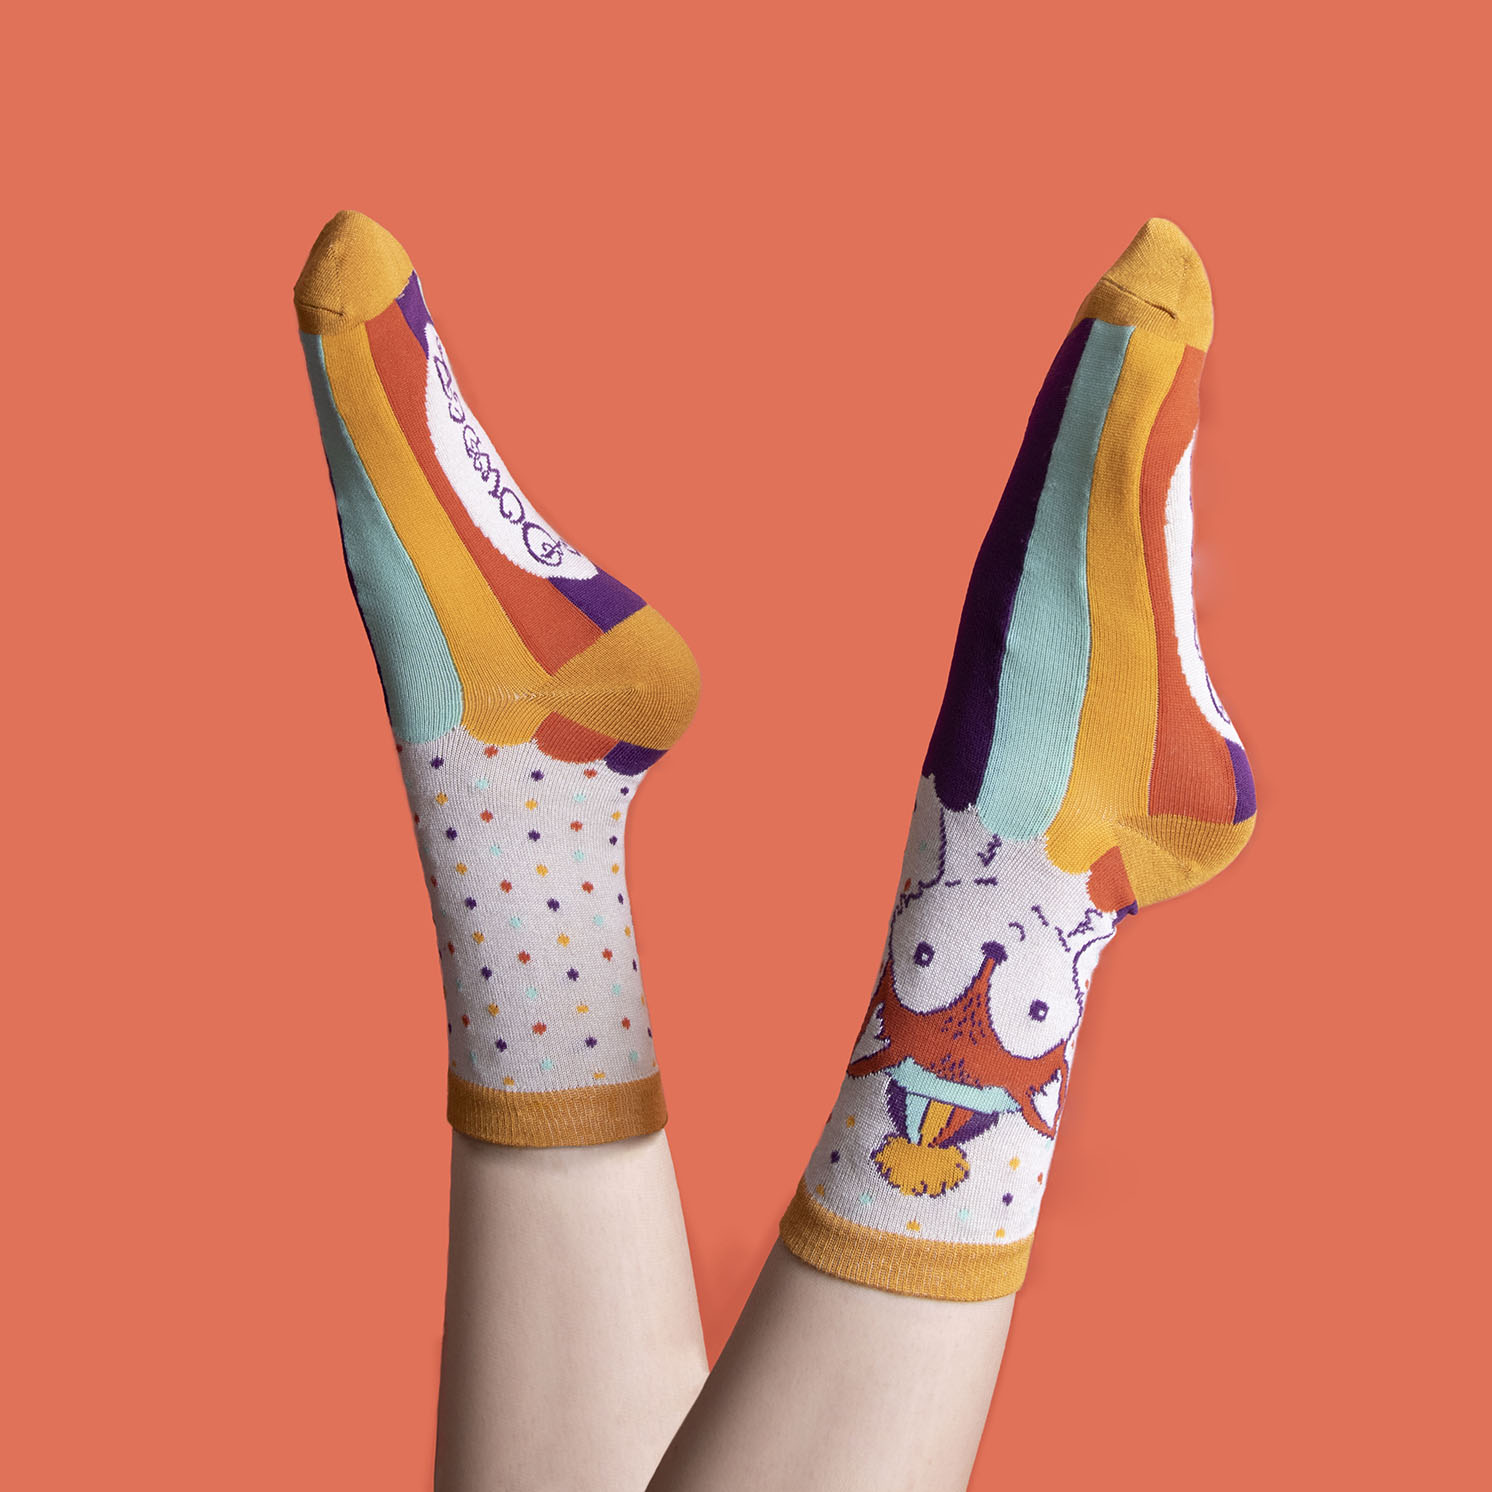 Powder – Cream Foxy Ankle Socks with Presentation Gift Bag